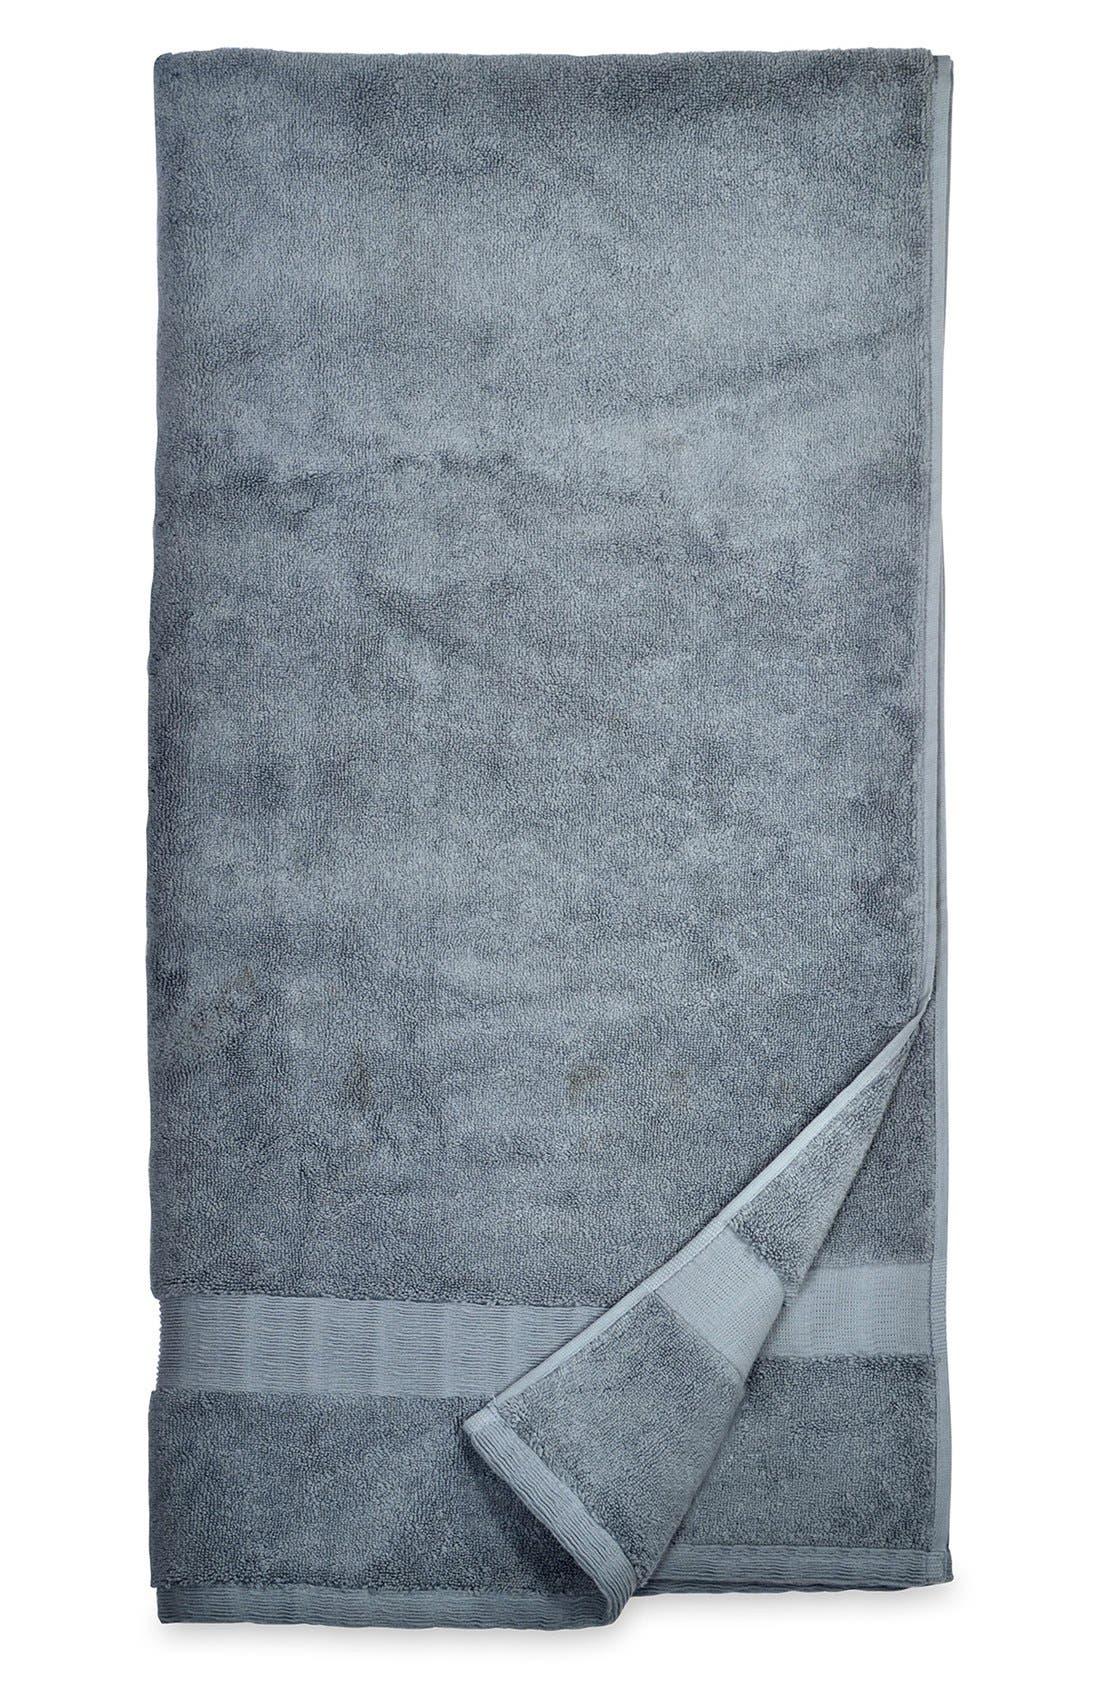 DKNY Mercer Bath Towel | Nordstrom